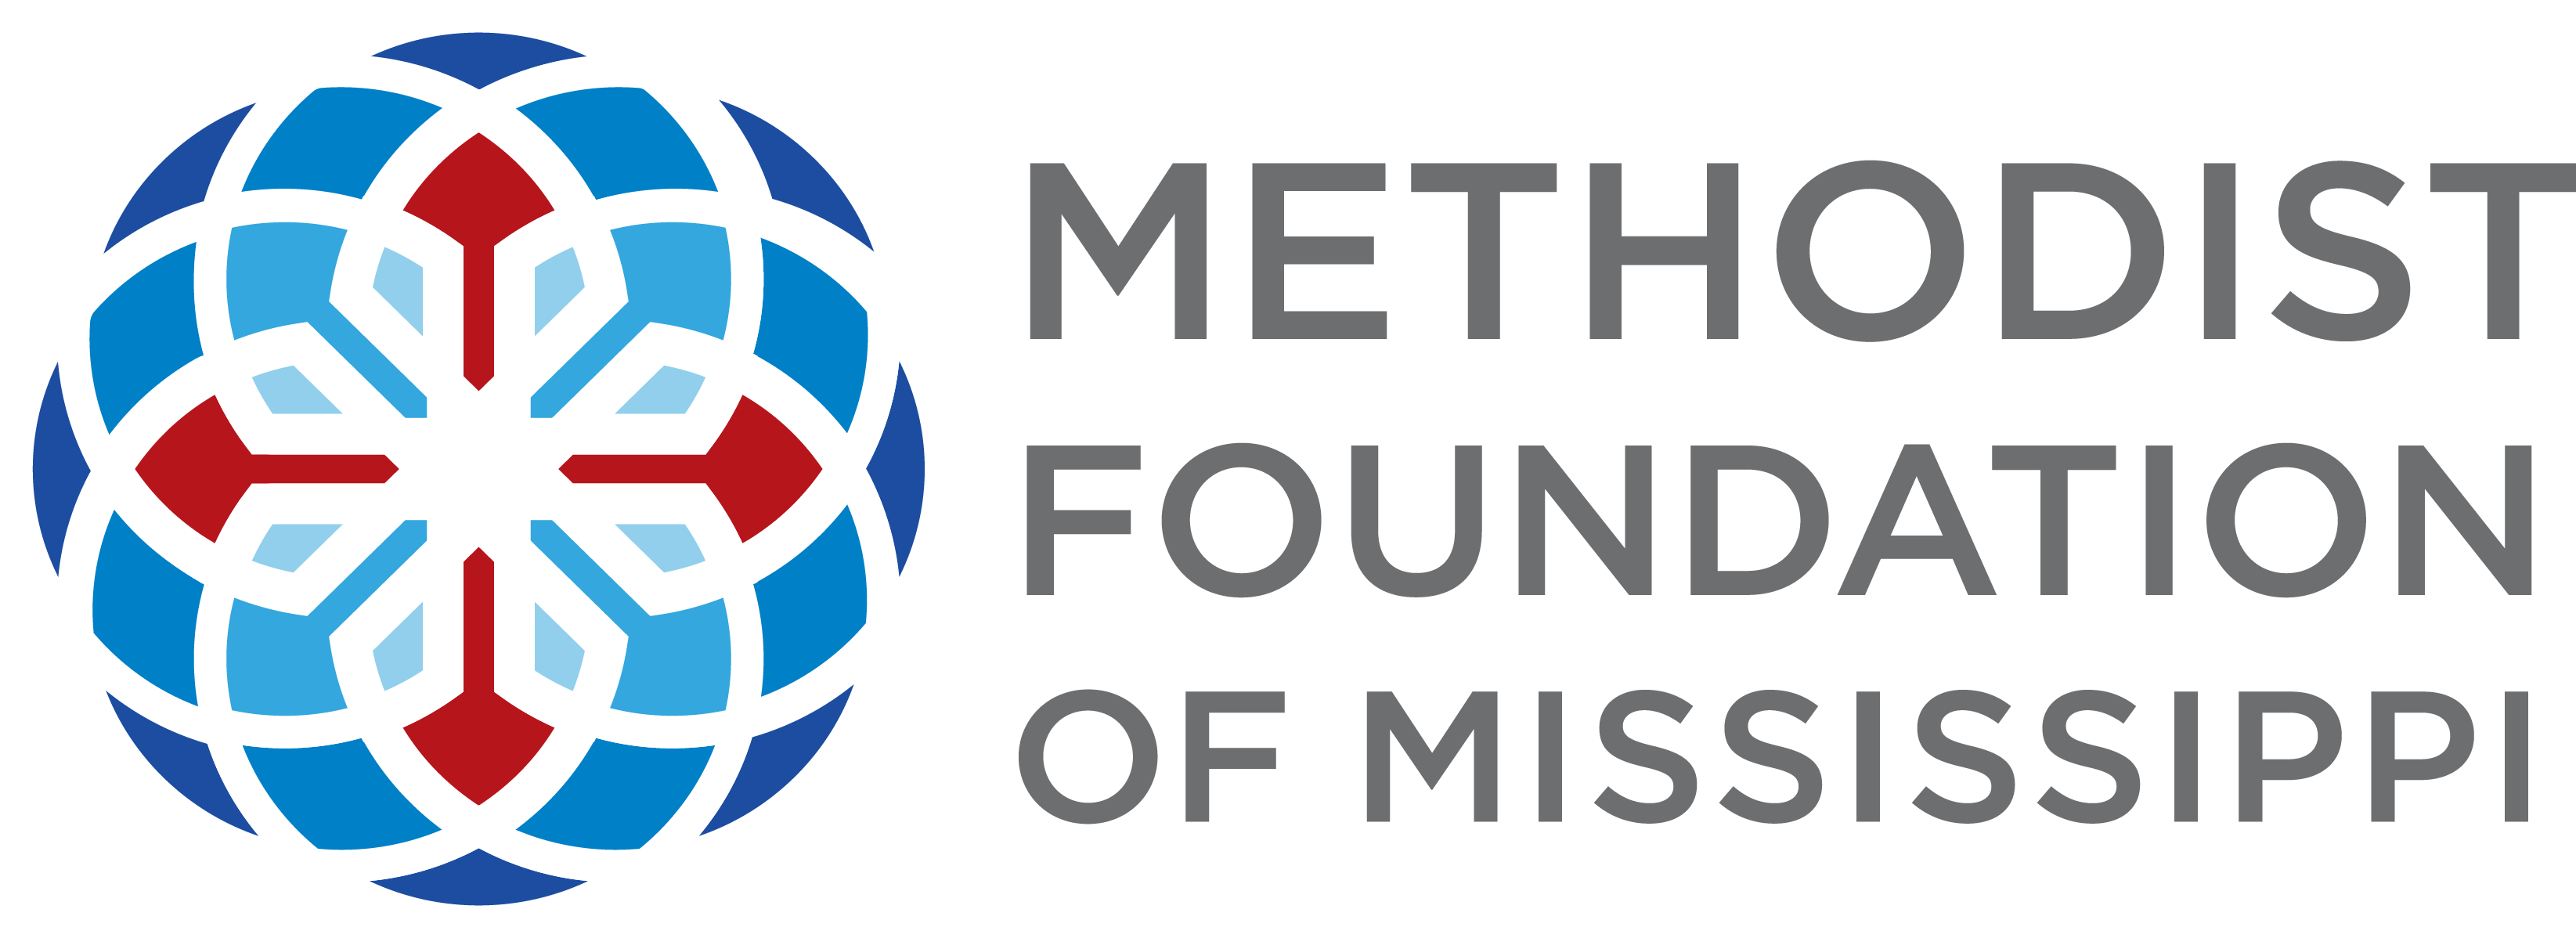 Methodist Foundation of Mississippi